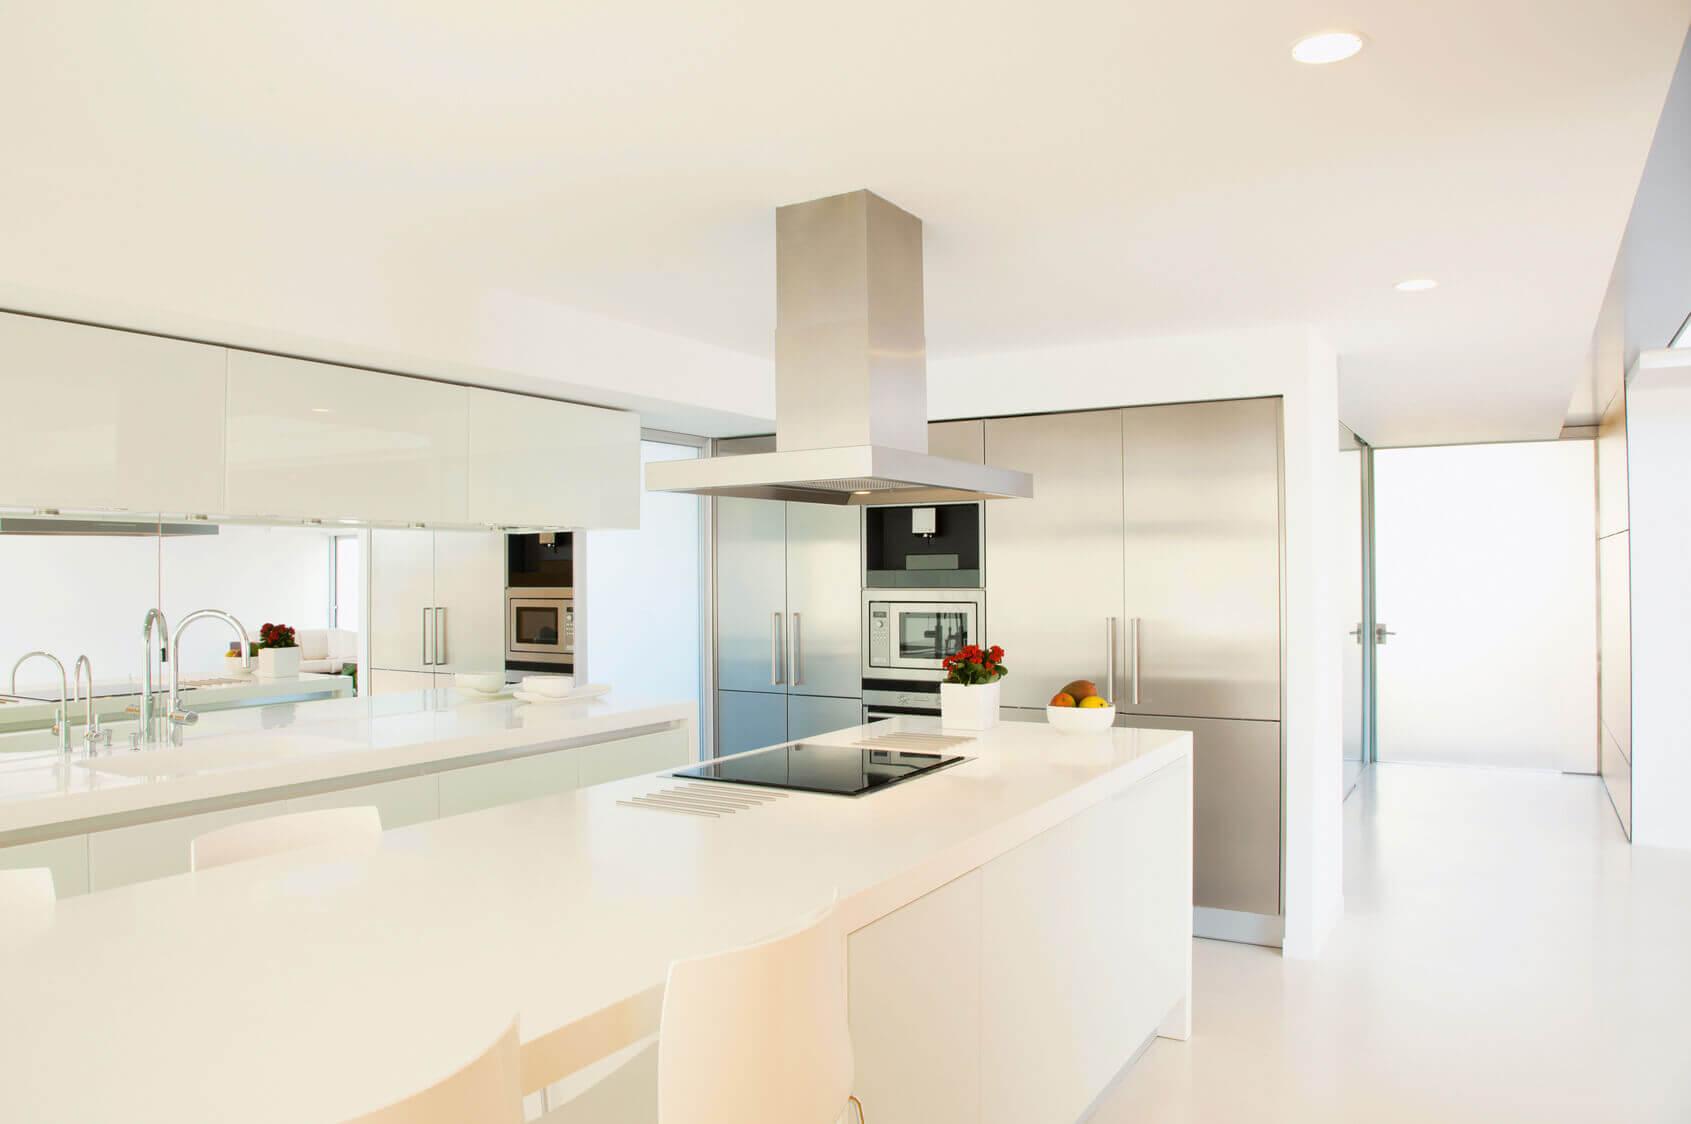 Cocinas con isla cocinas vitoria tierra home design for Cocinas con isla